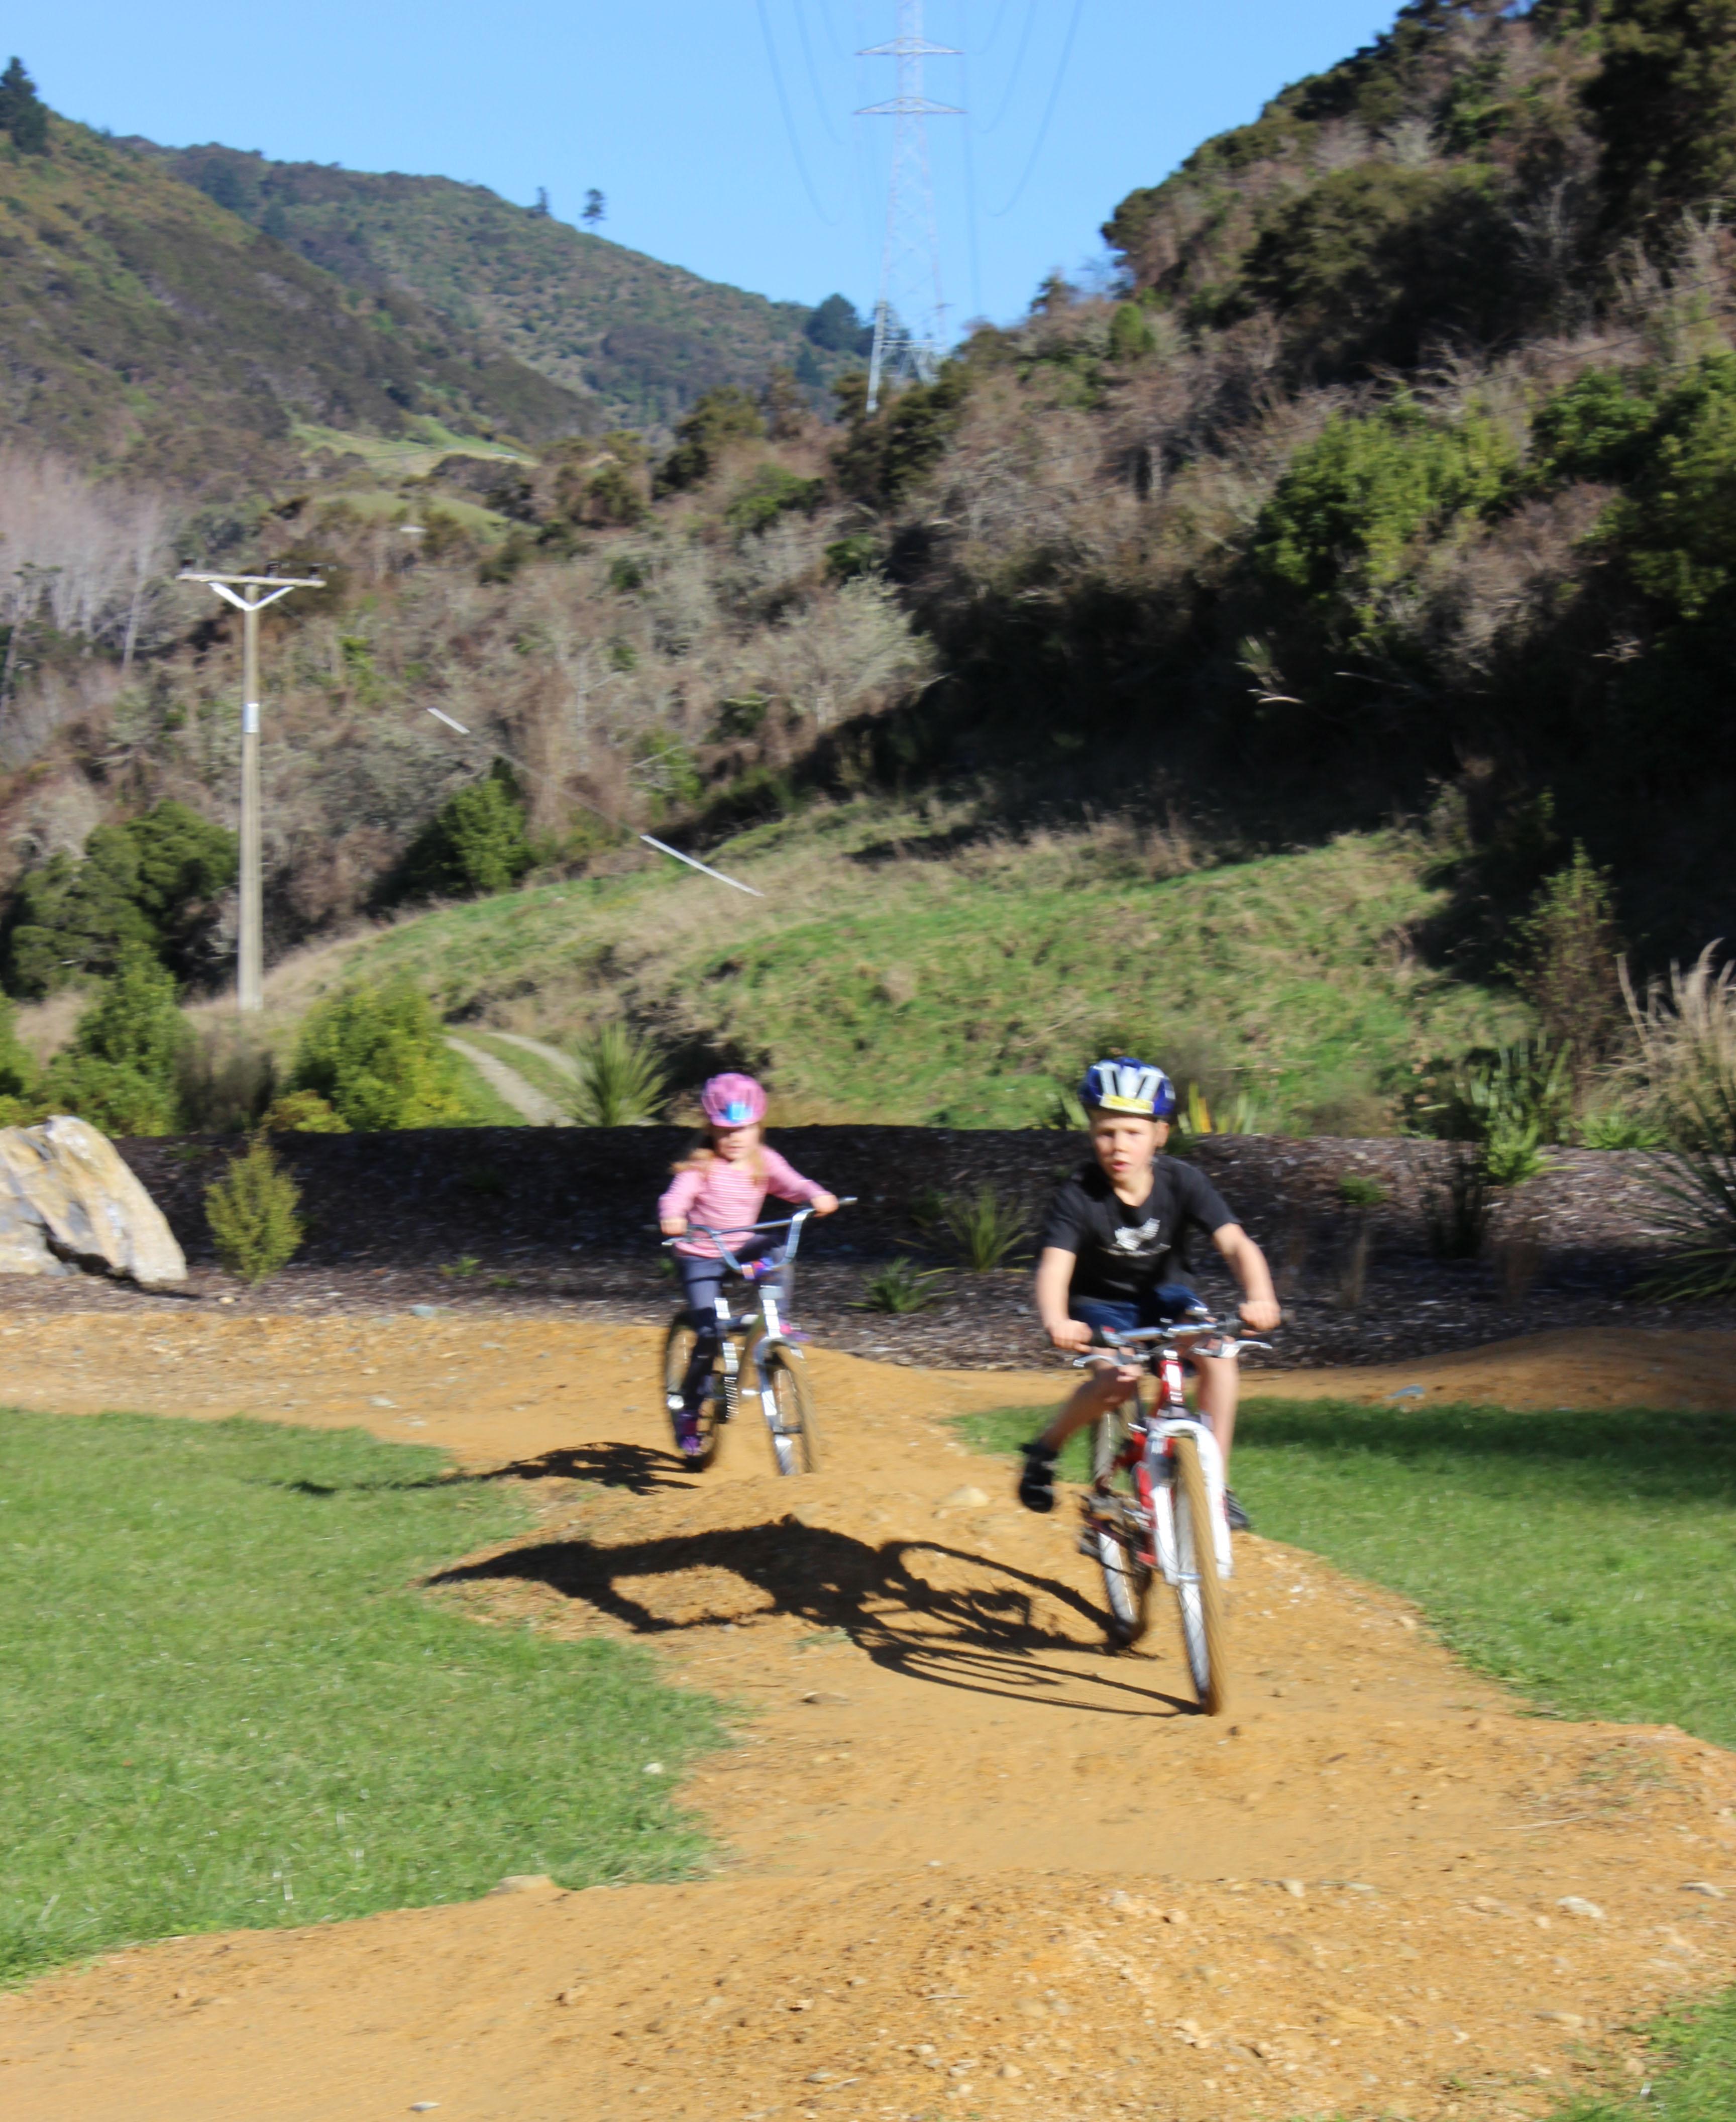 Follow leader riding cycling kids Waimarama sanctuary pump track goRide